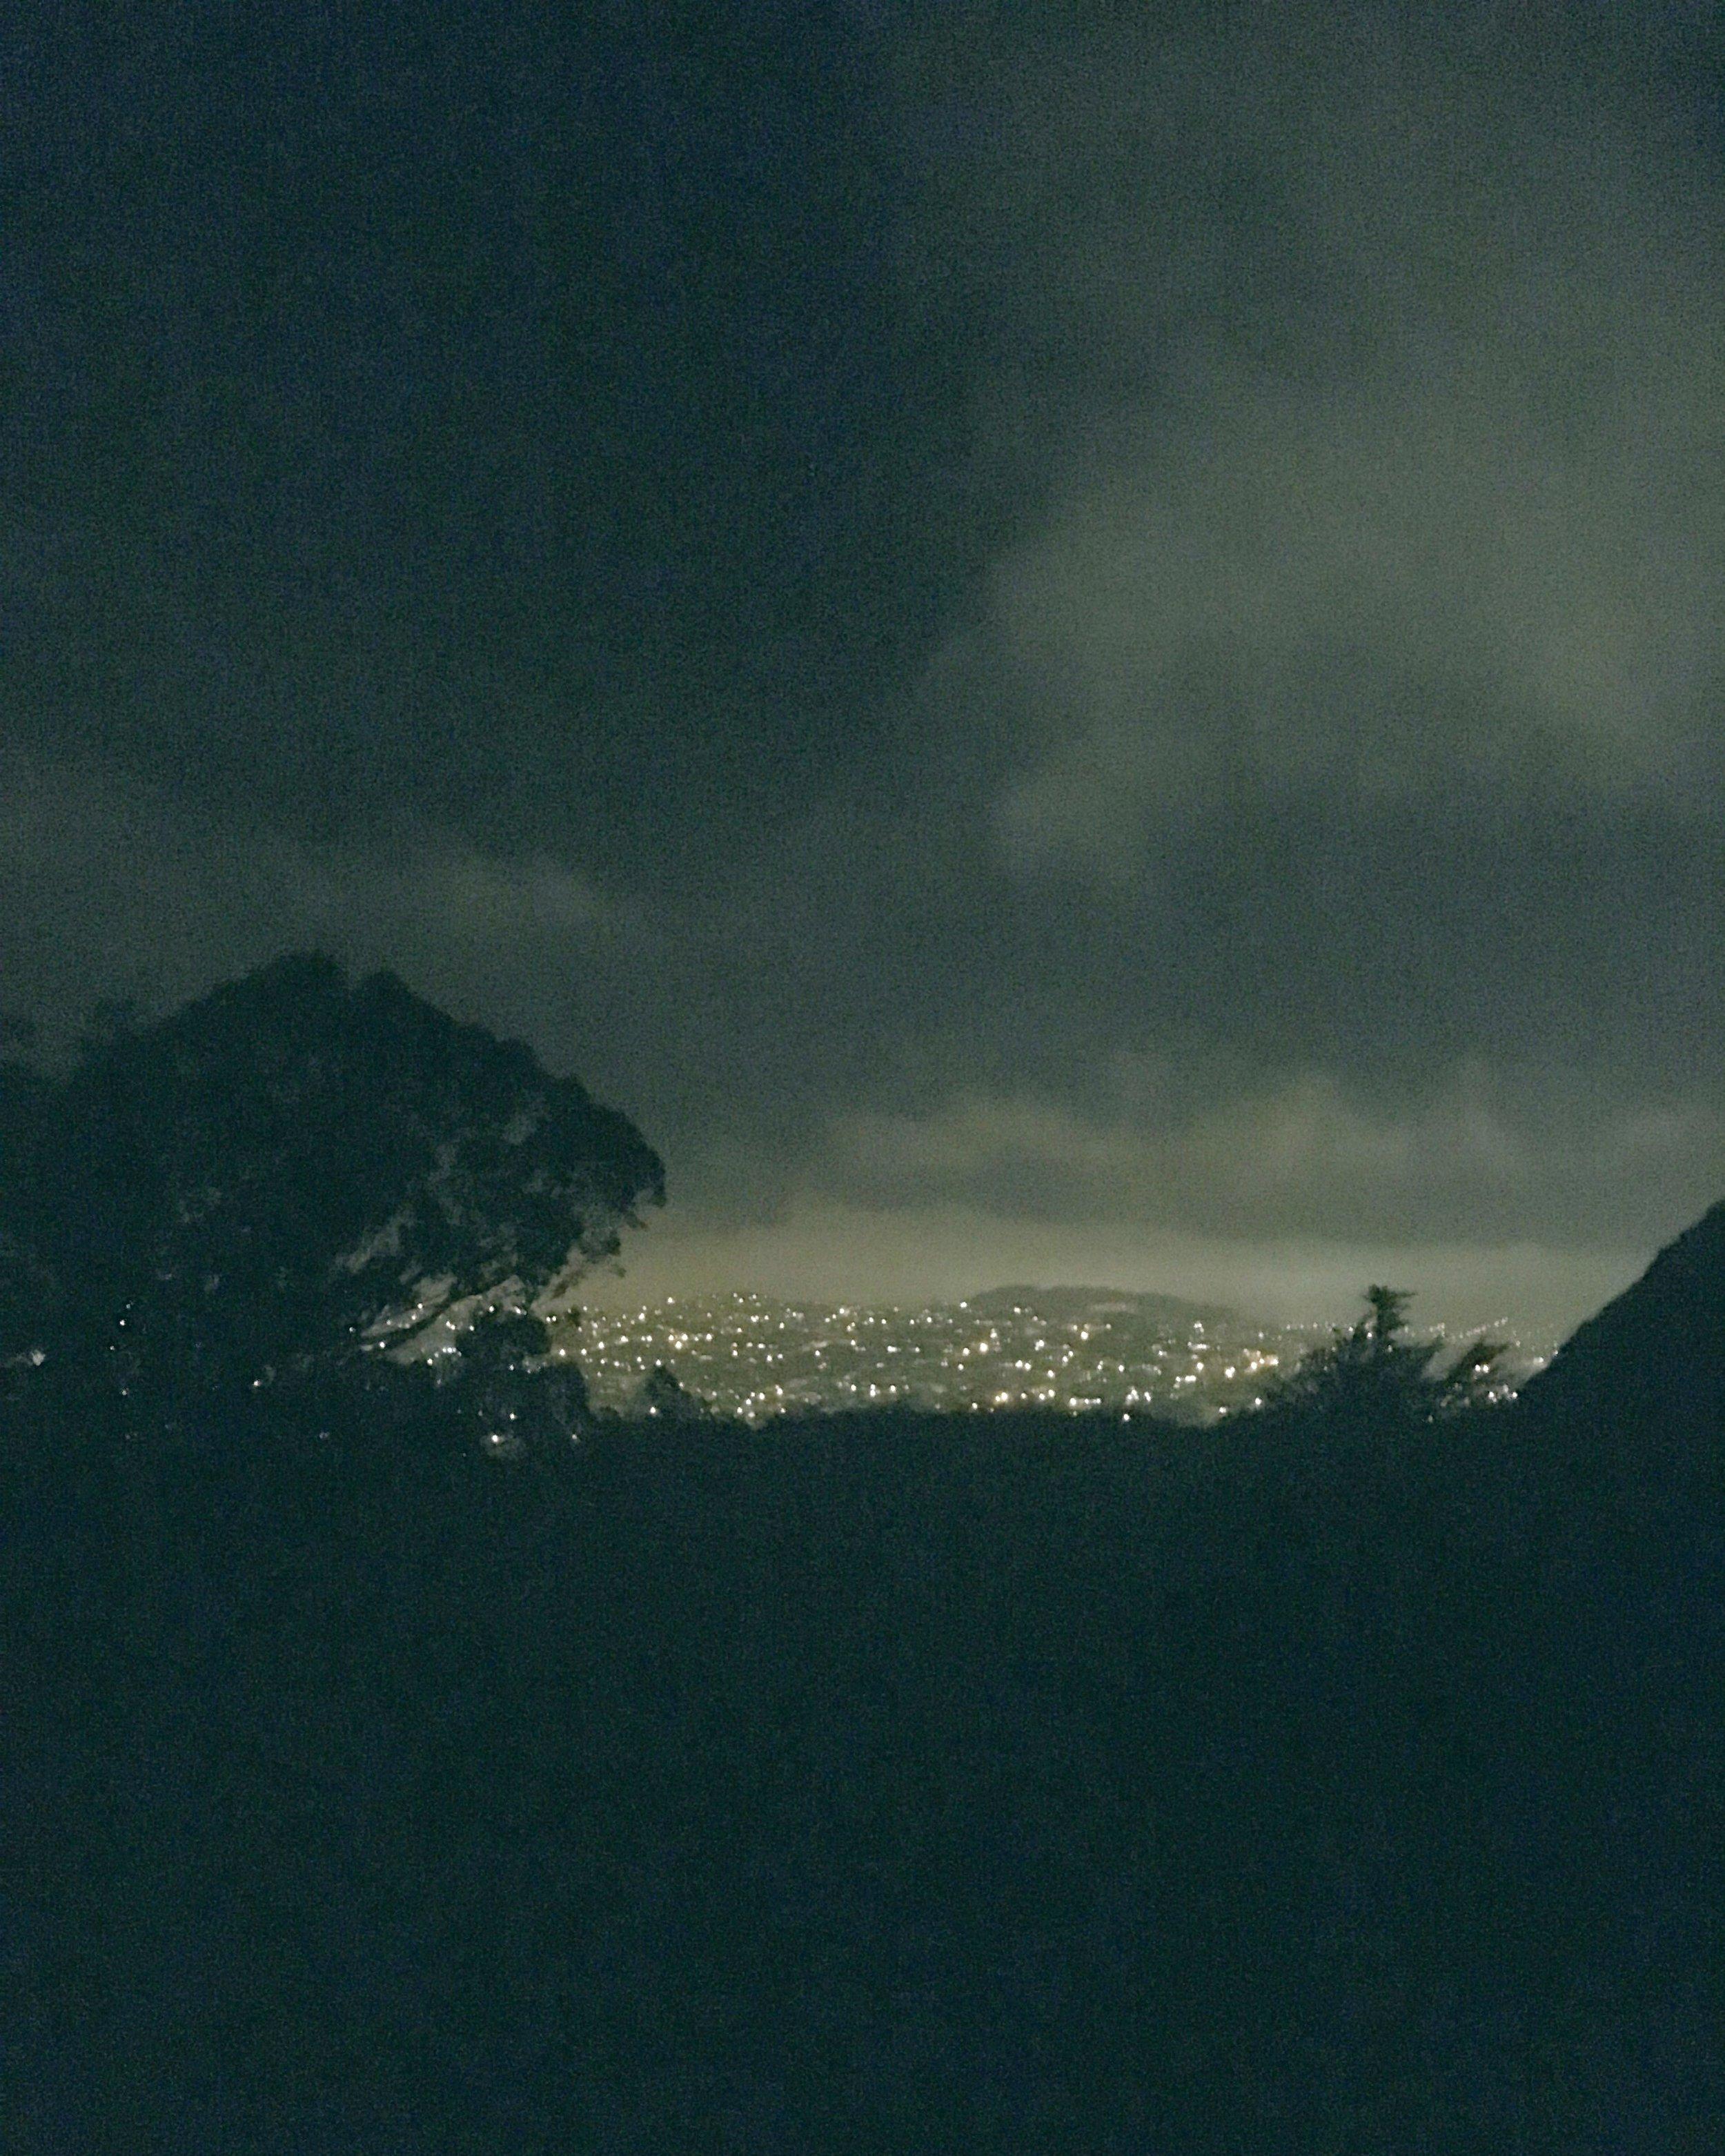 Bernal at night